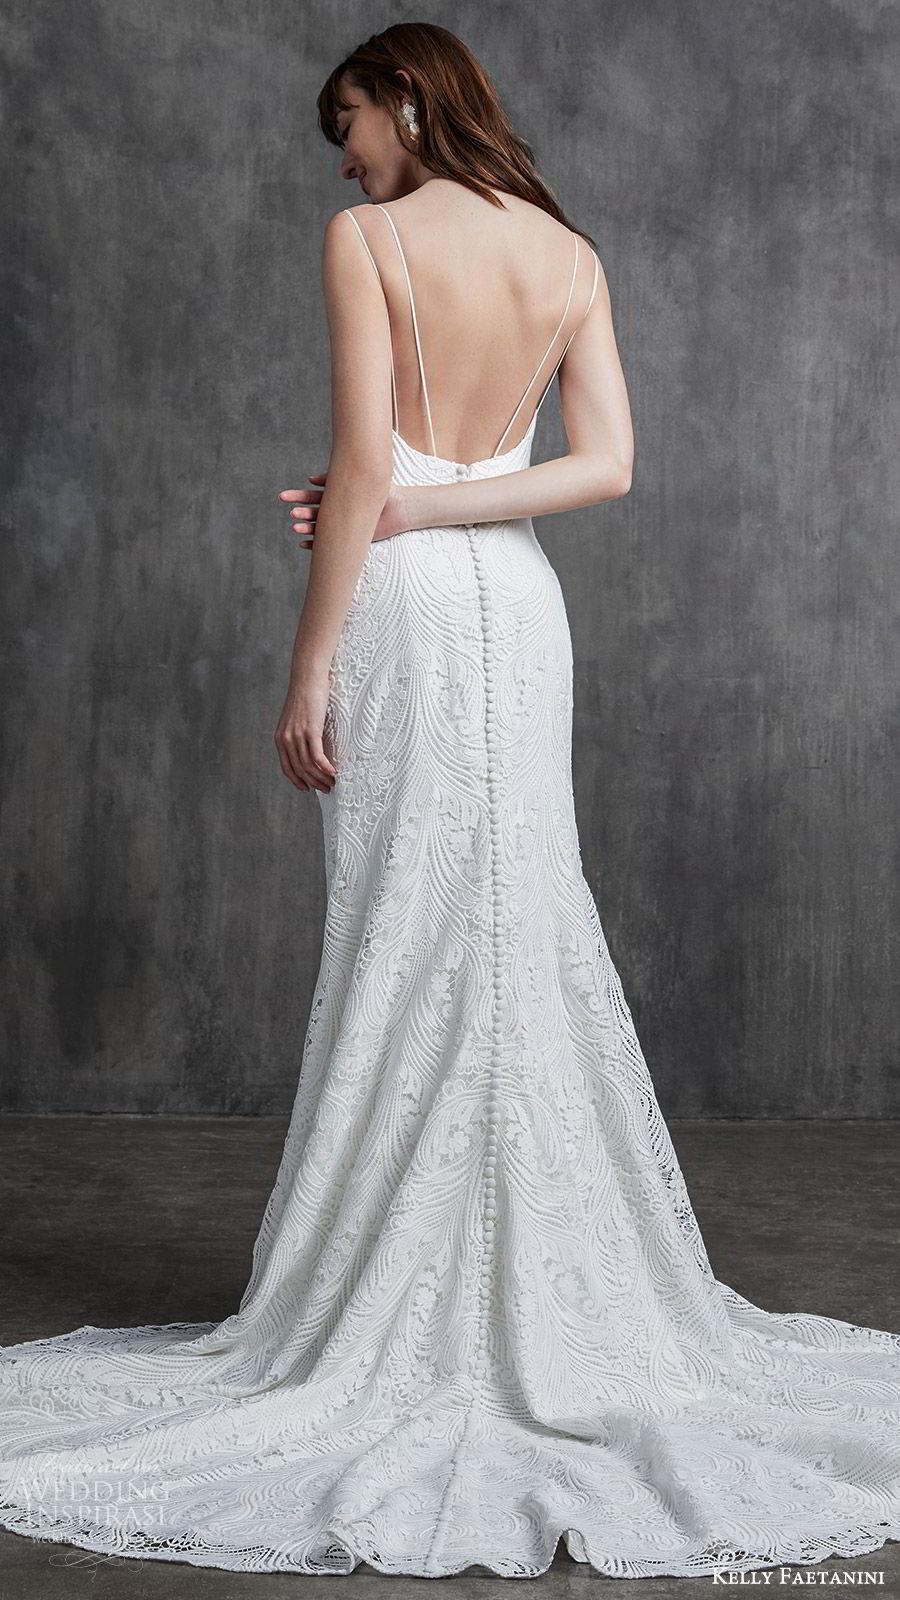 kelly faetanini spring 2020 bridal sleeveless thin strpas v neckline sheath mermaid lace wedding dress (3) low back chapel train elegant bv